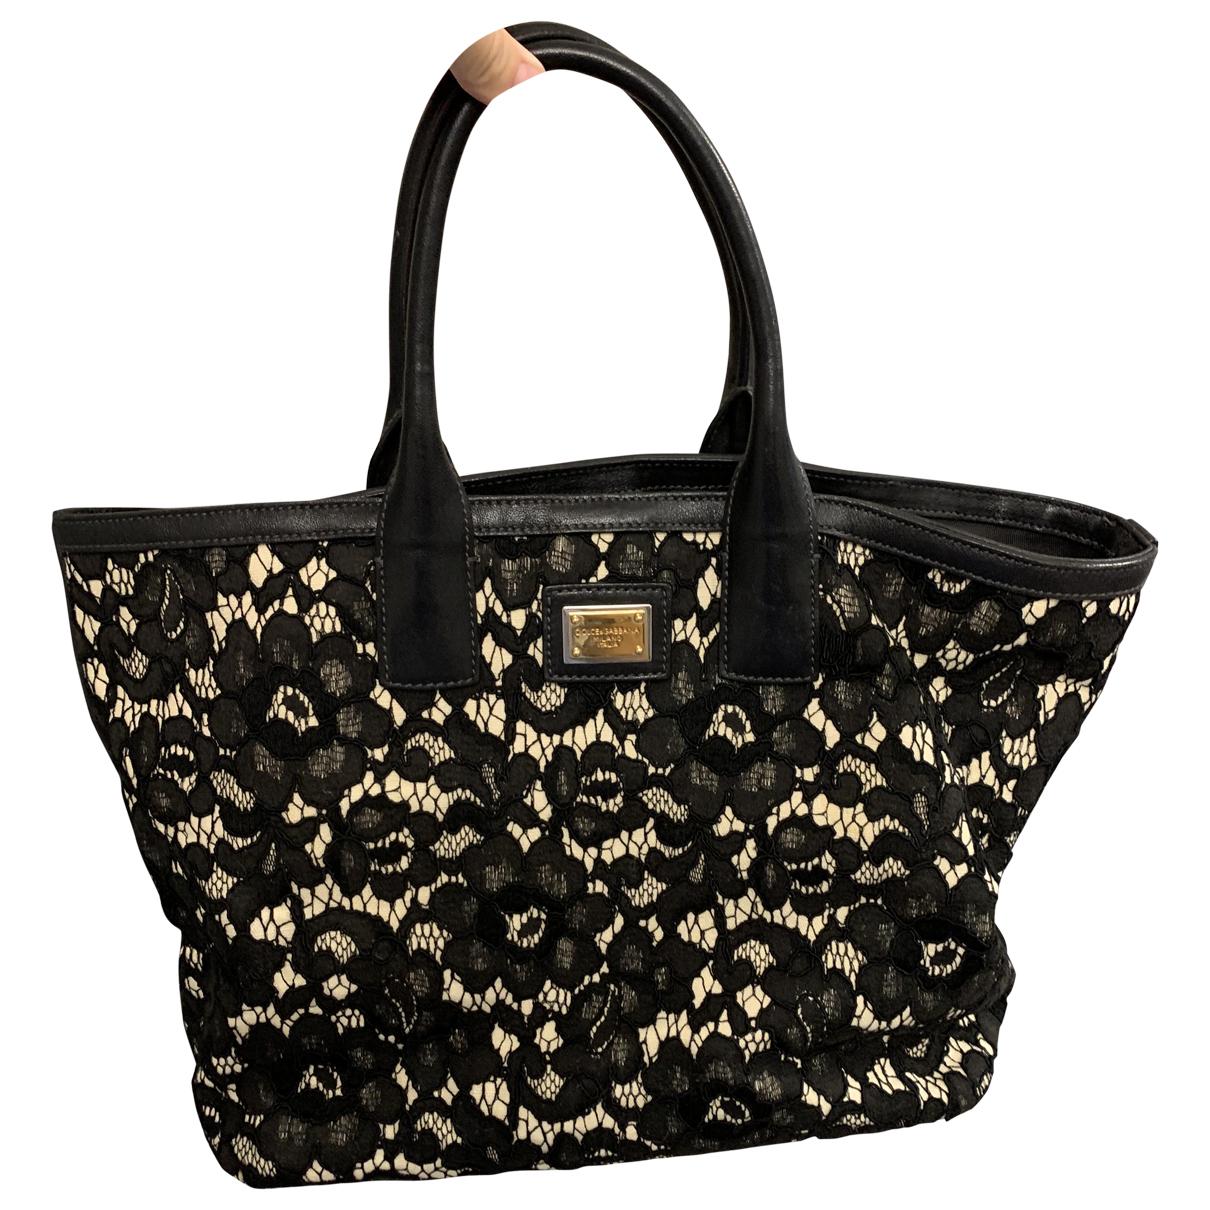 Dolce & Gabbana N Black Cotton handbag for Women N